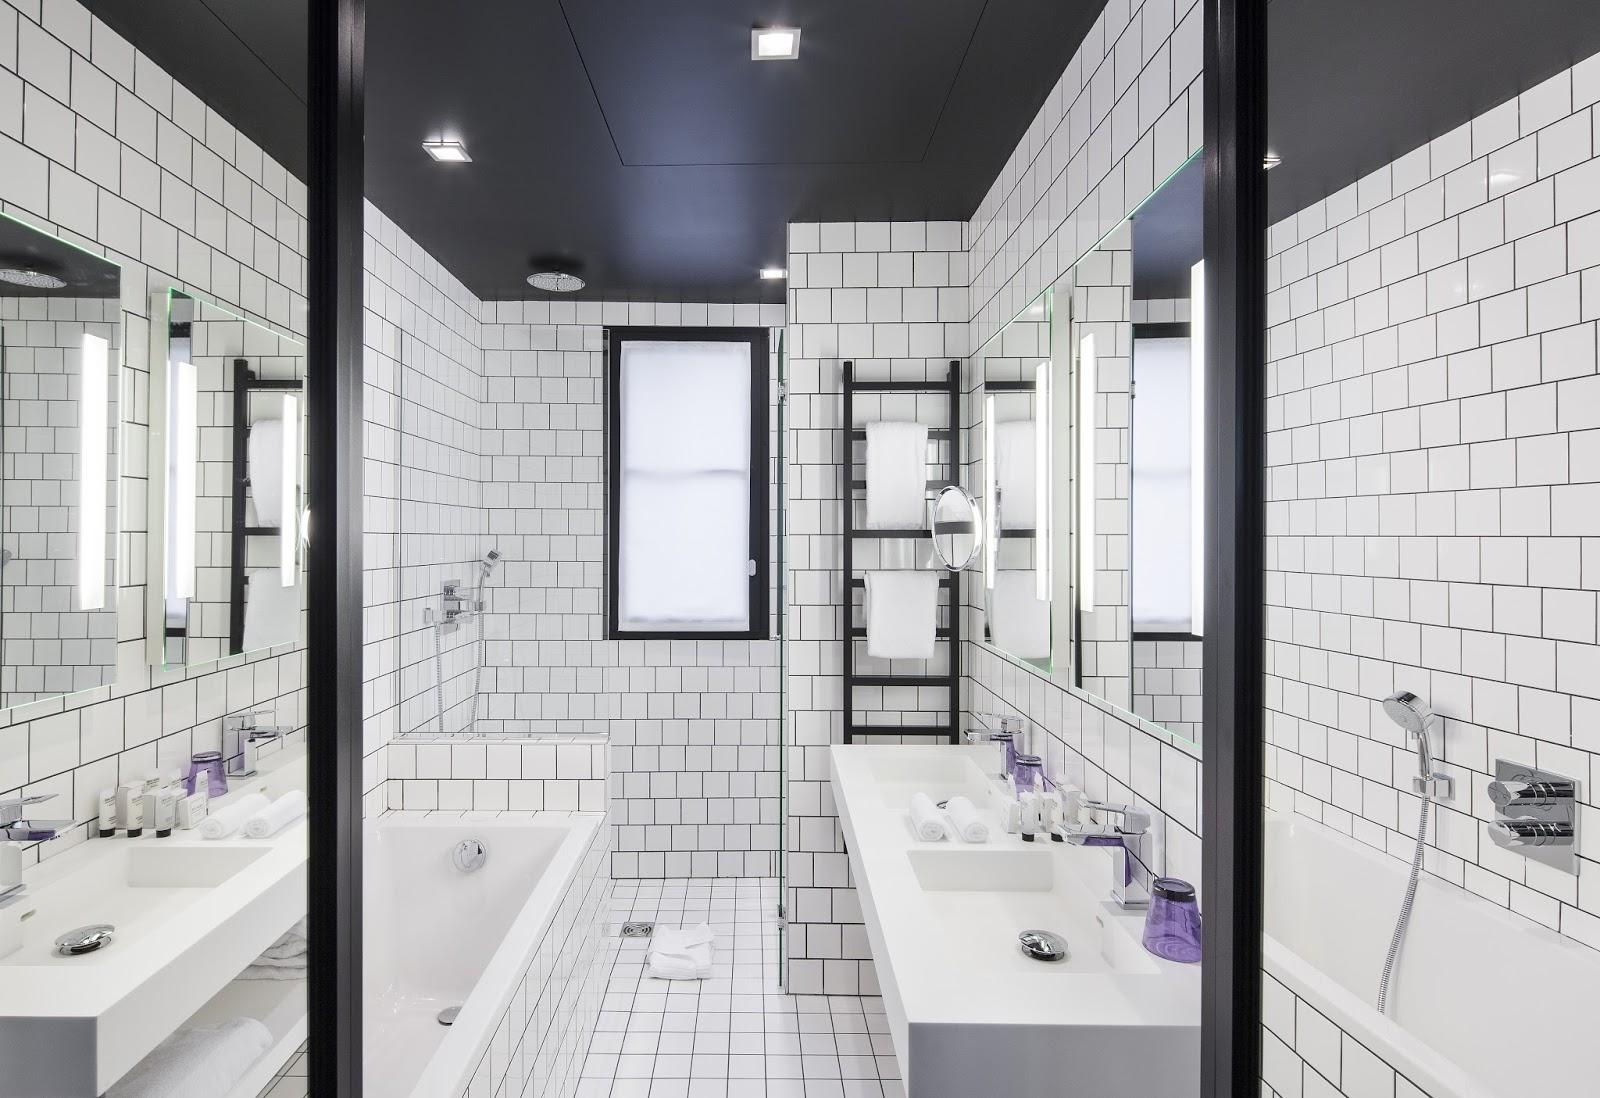 Carrelage salle de bain romantique for Carrelage brillant